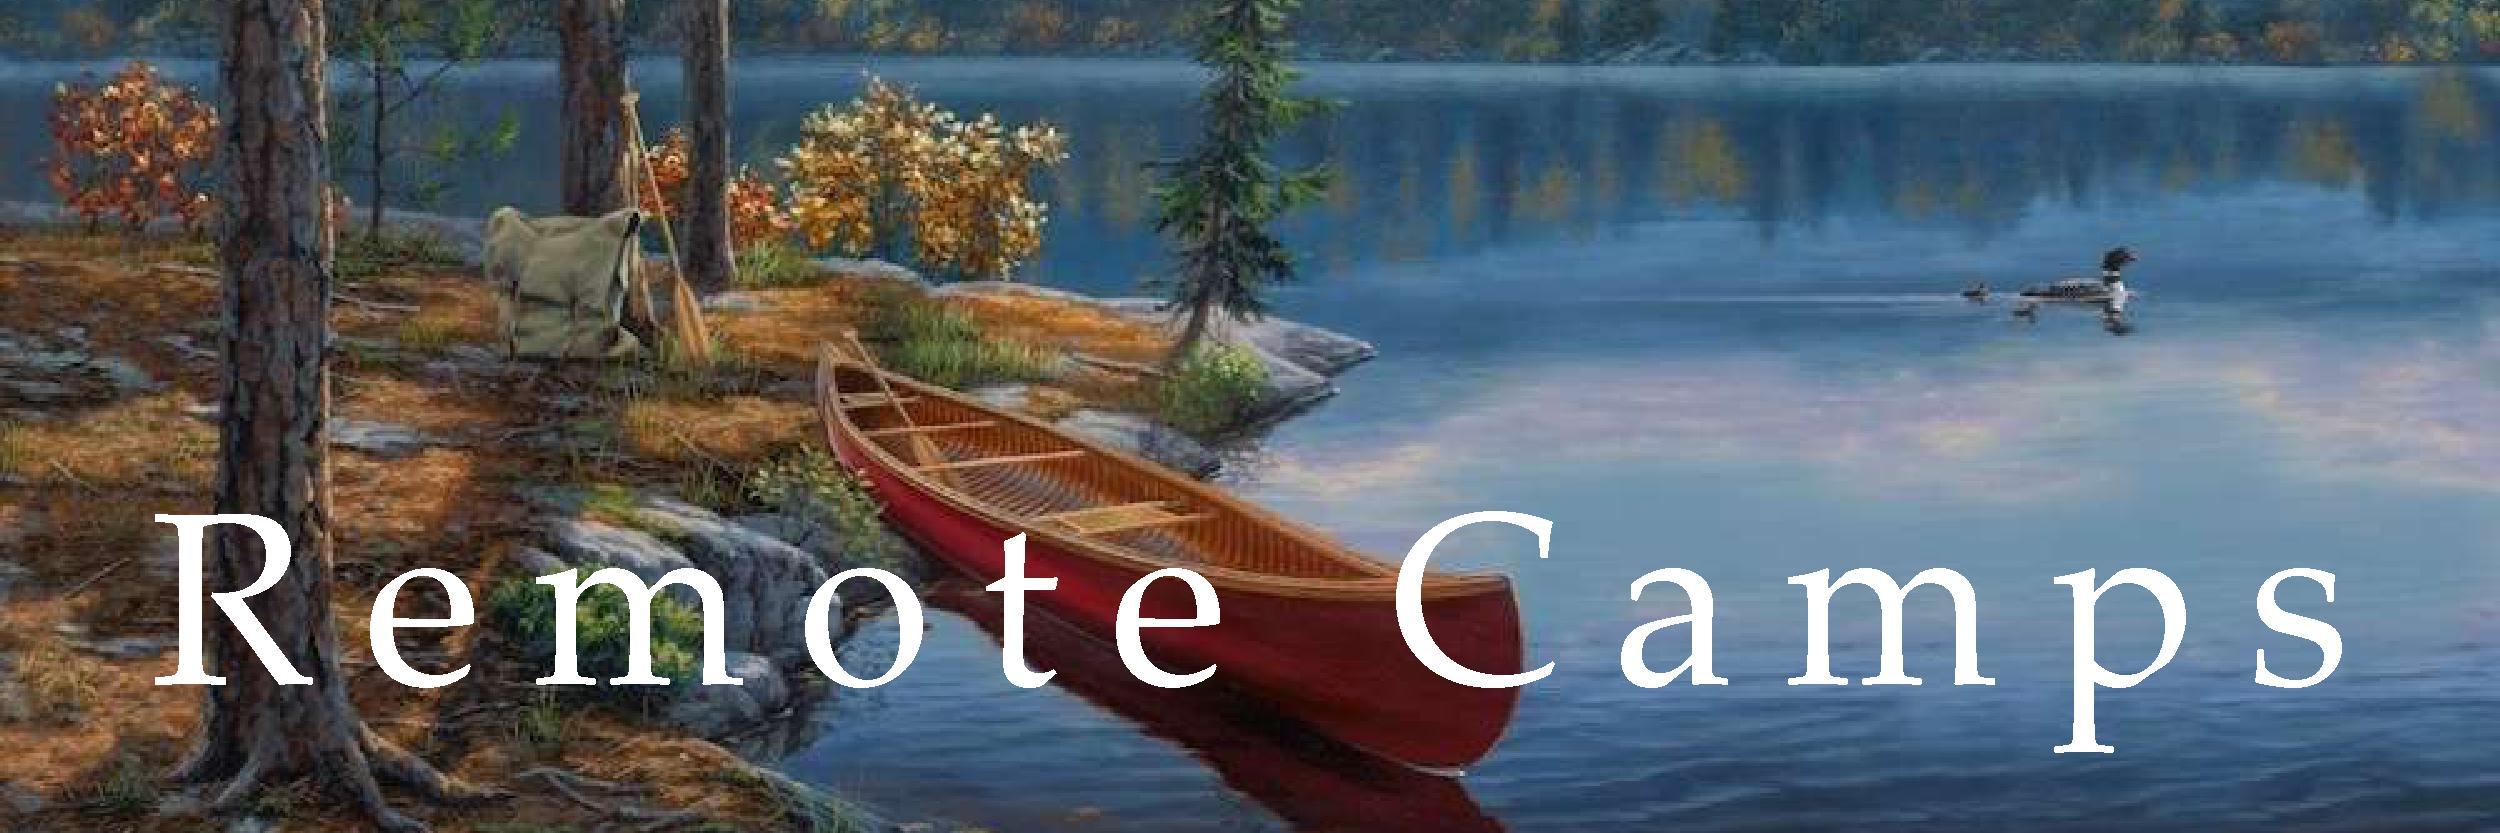 Remote Camps | DBArt button.jpg